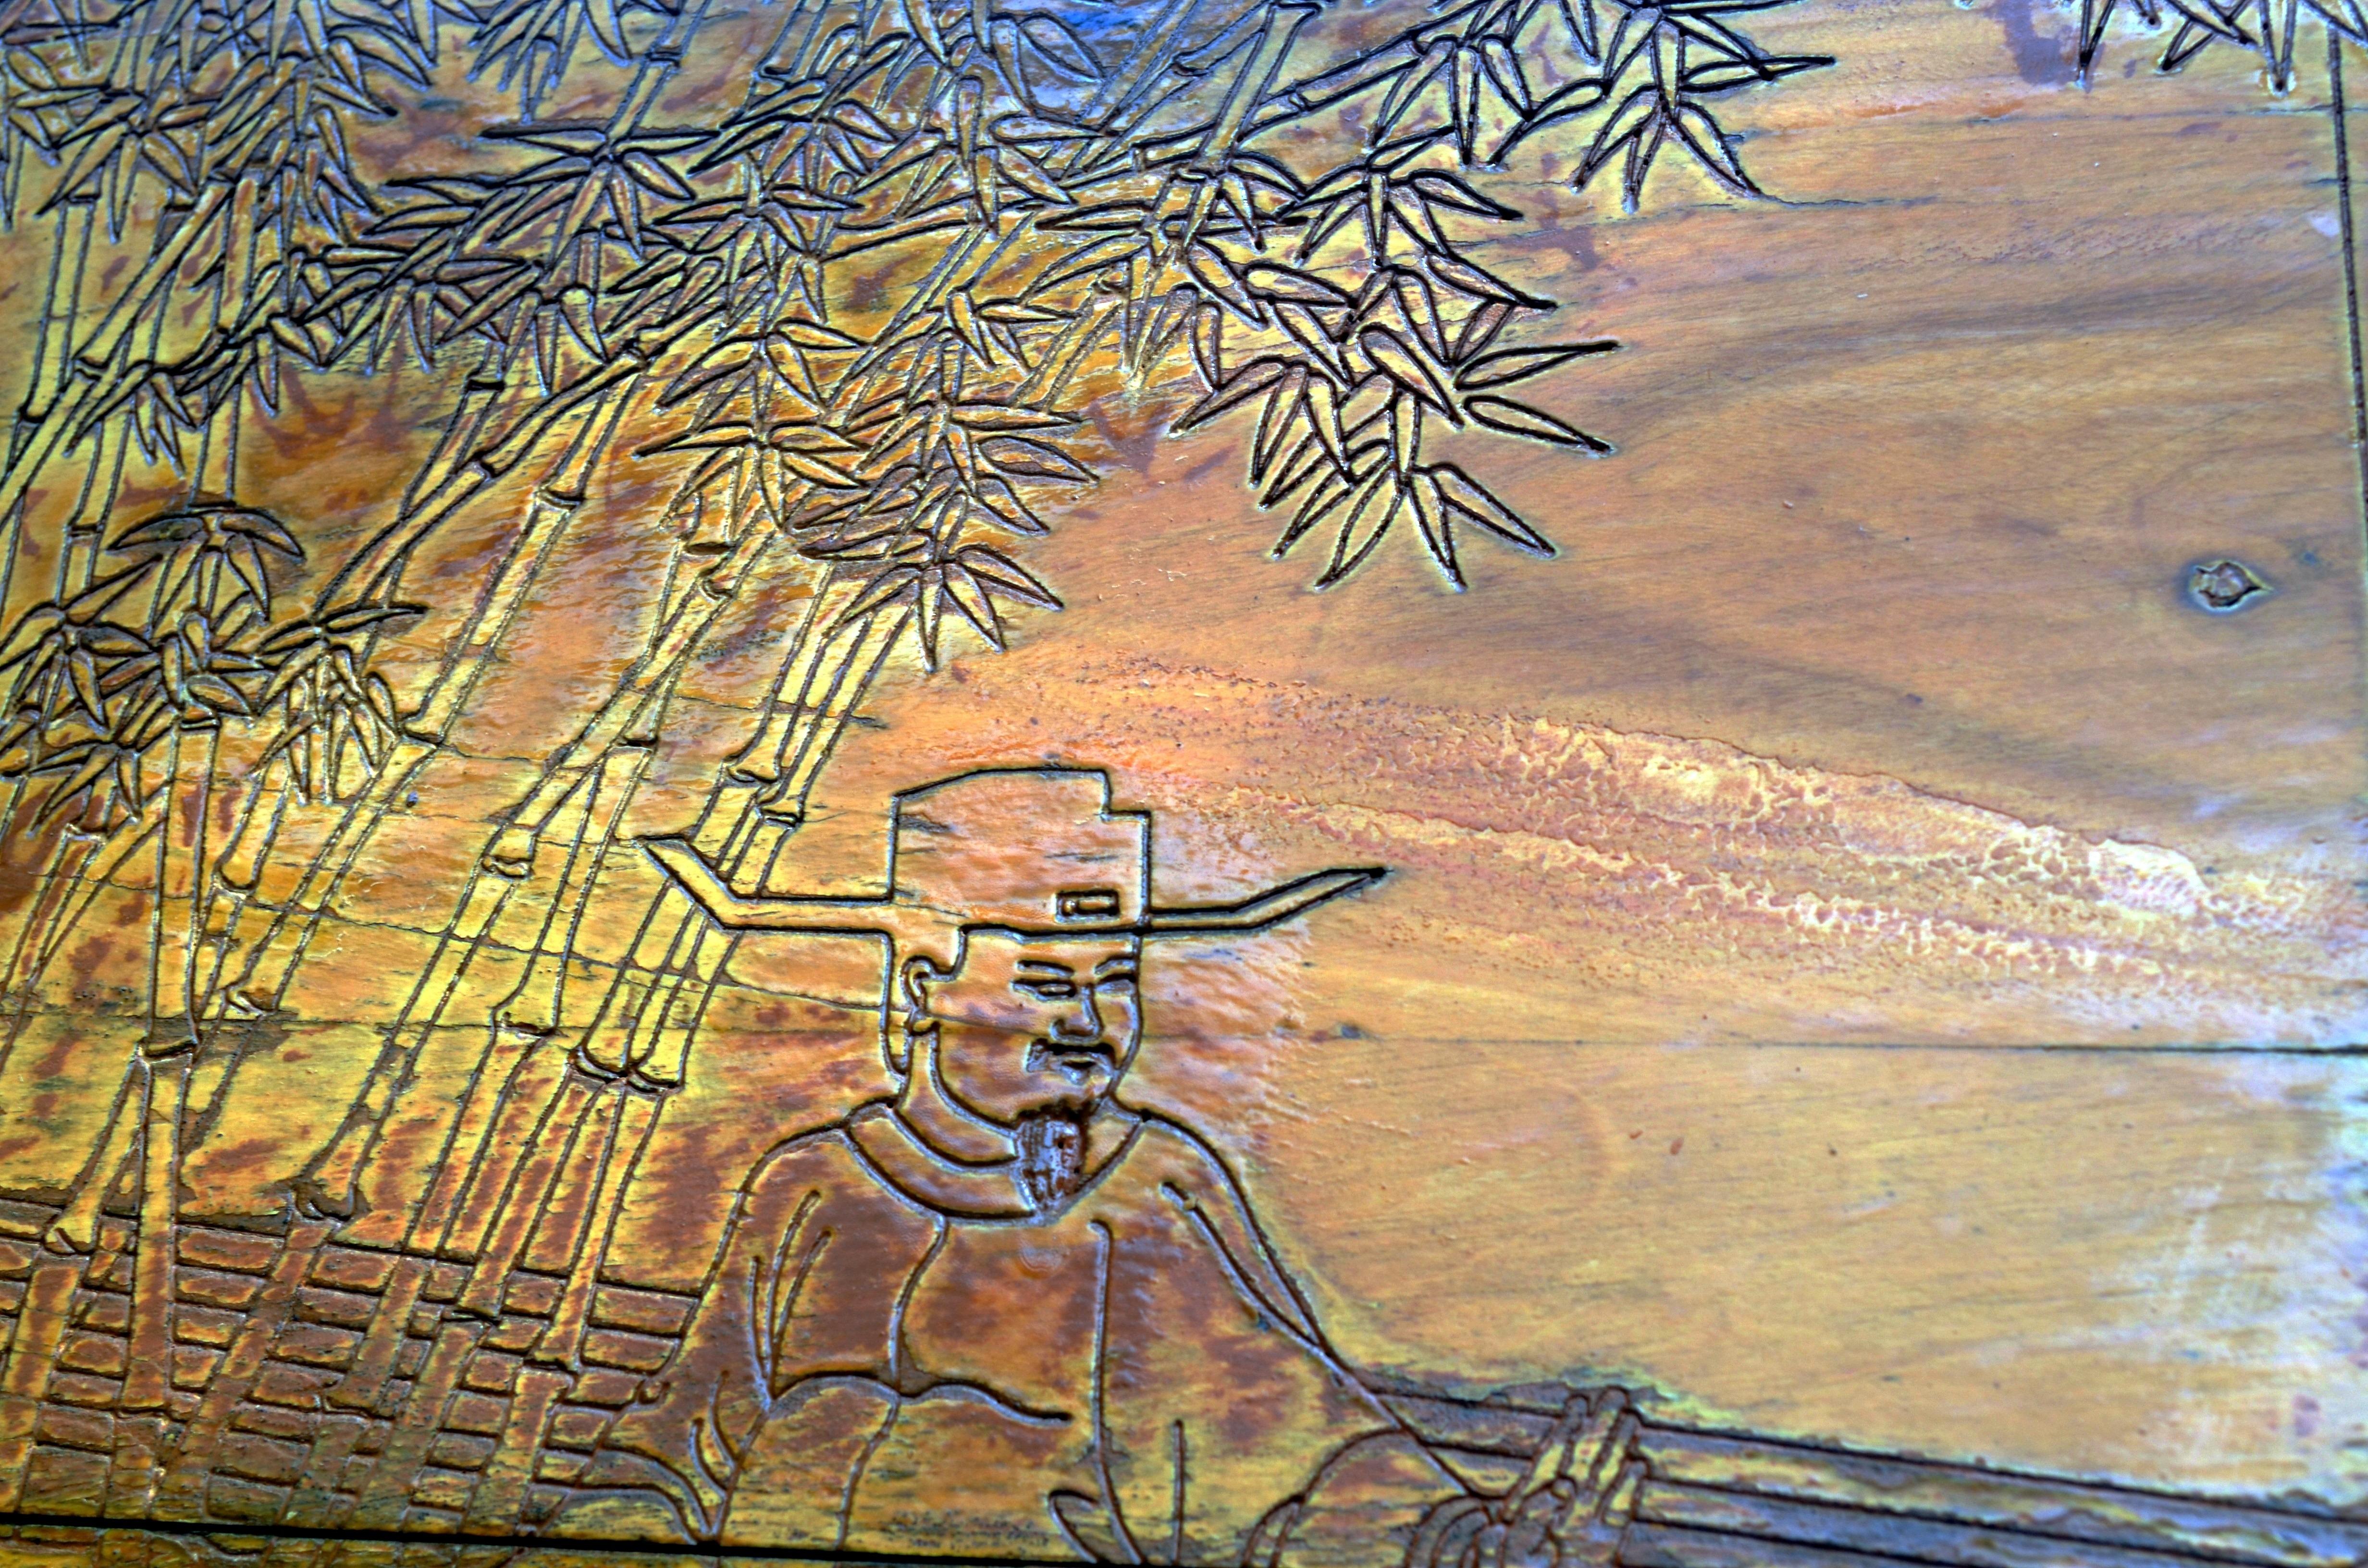 Gambar Kayu Cina Lukisan Sketsa Gambar Berukir